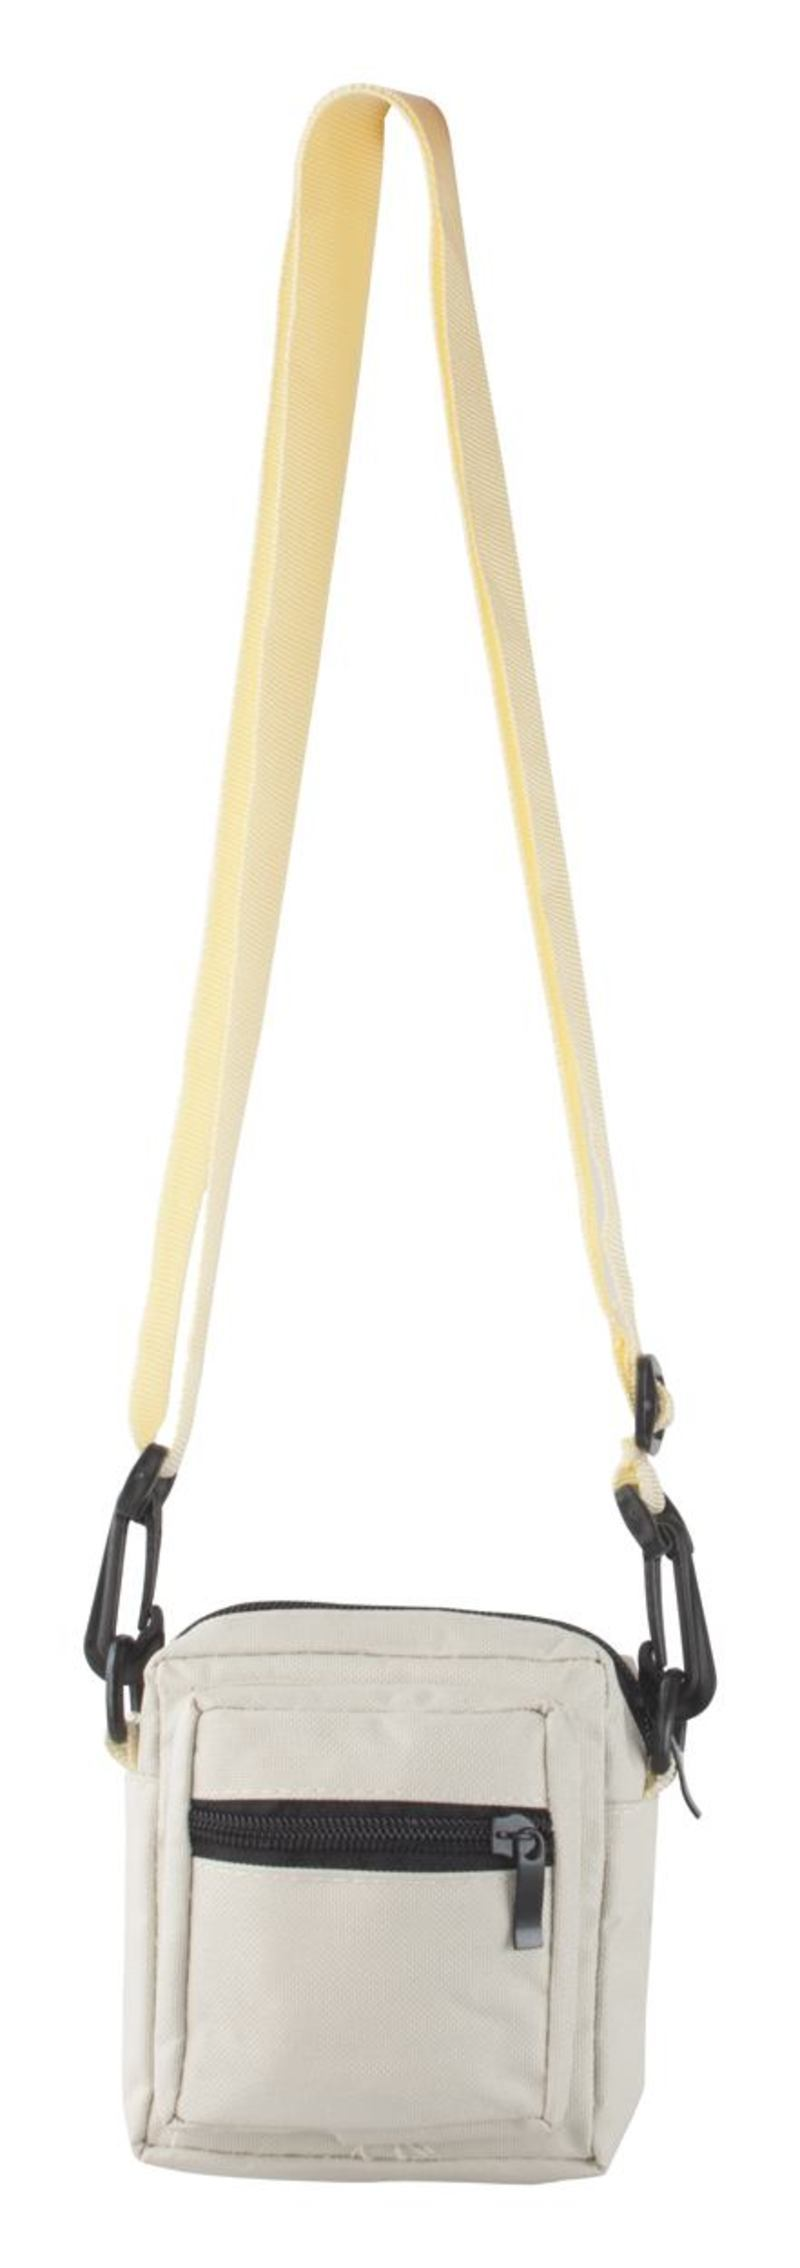 Criss shoulder bag